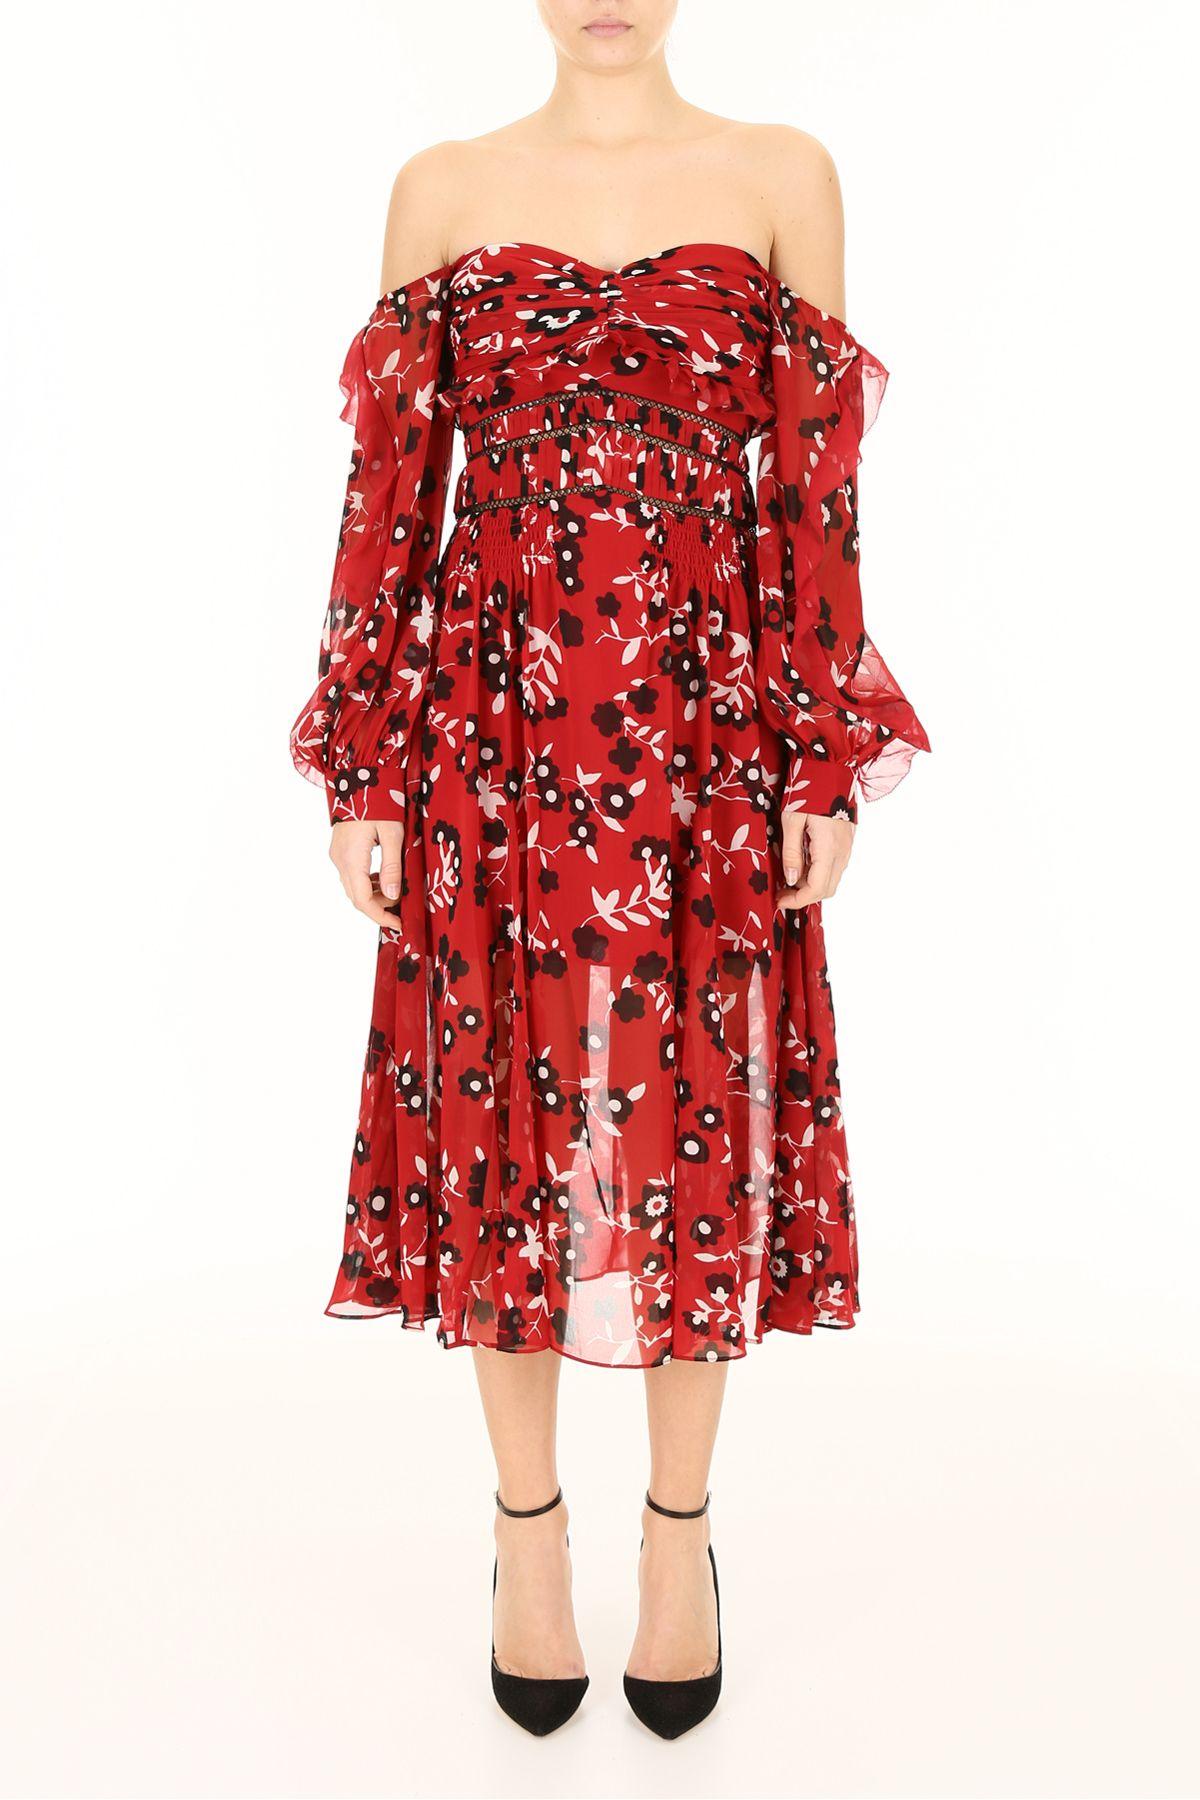 d89ab115aa59 self-portrait self-portrait Floral Print Midi Dress - RED (Red ...